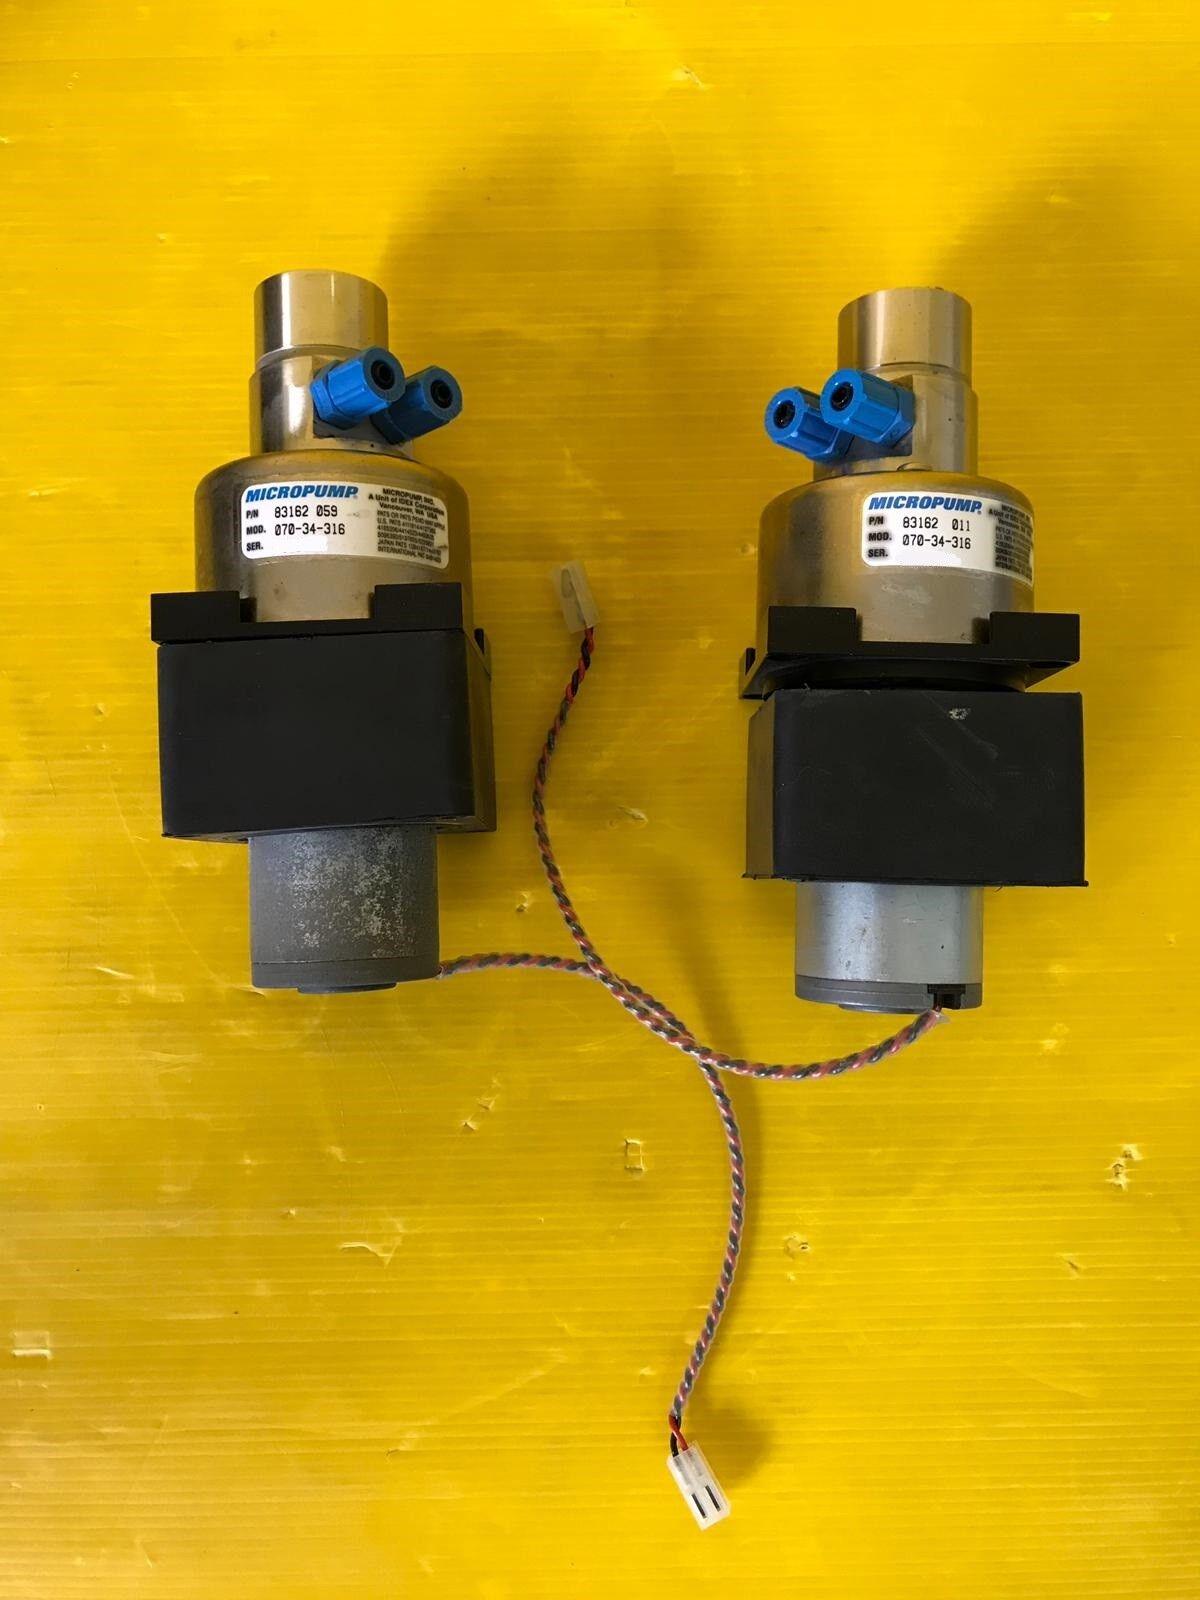 Micropump 070-34-316 83162 059 W  83162 011 Dunkermotoren G42x25